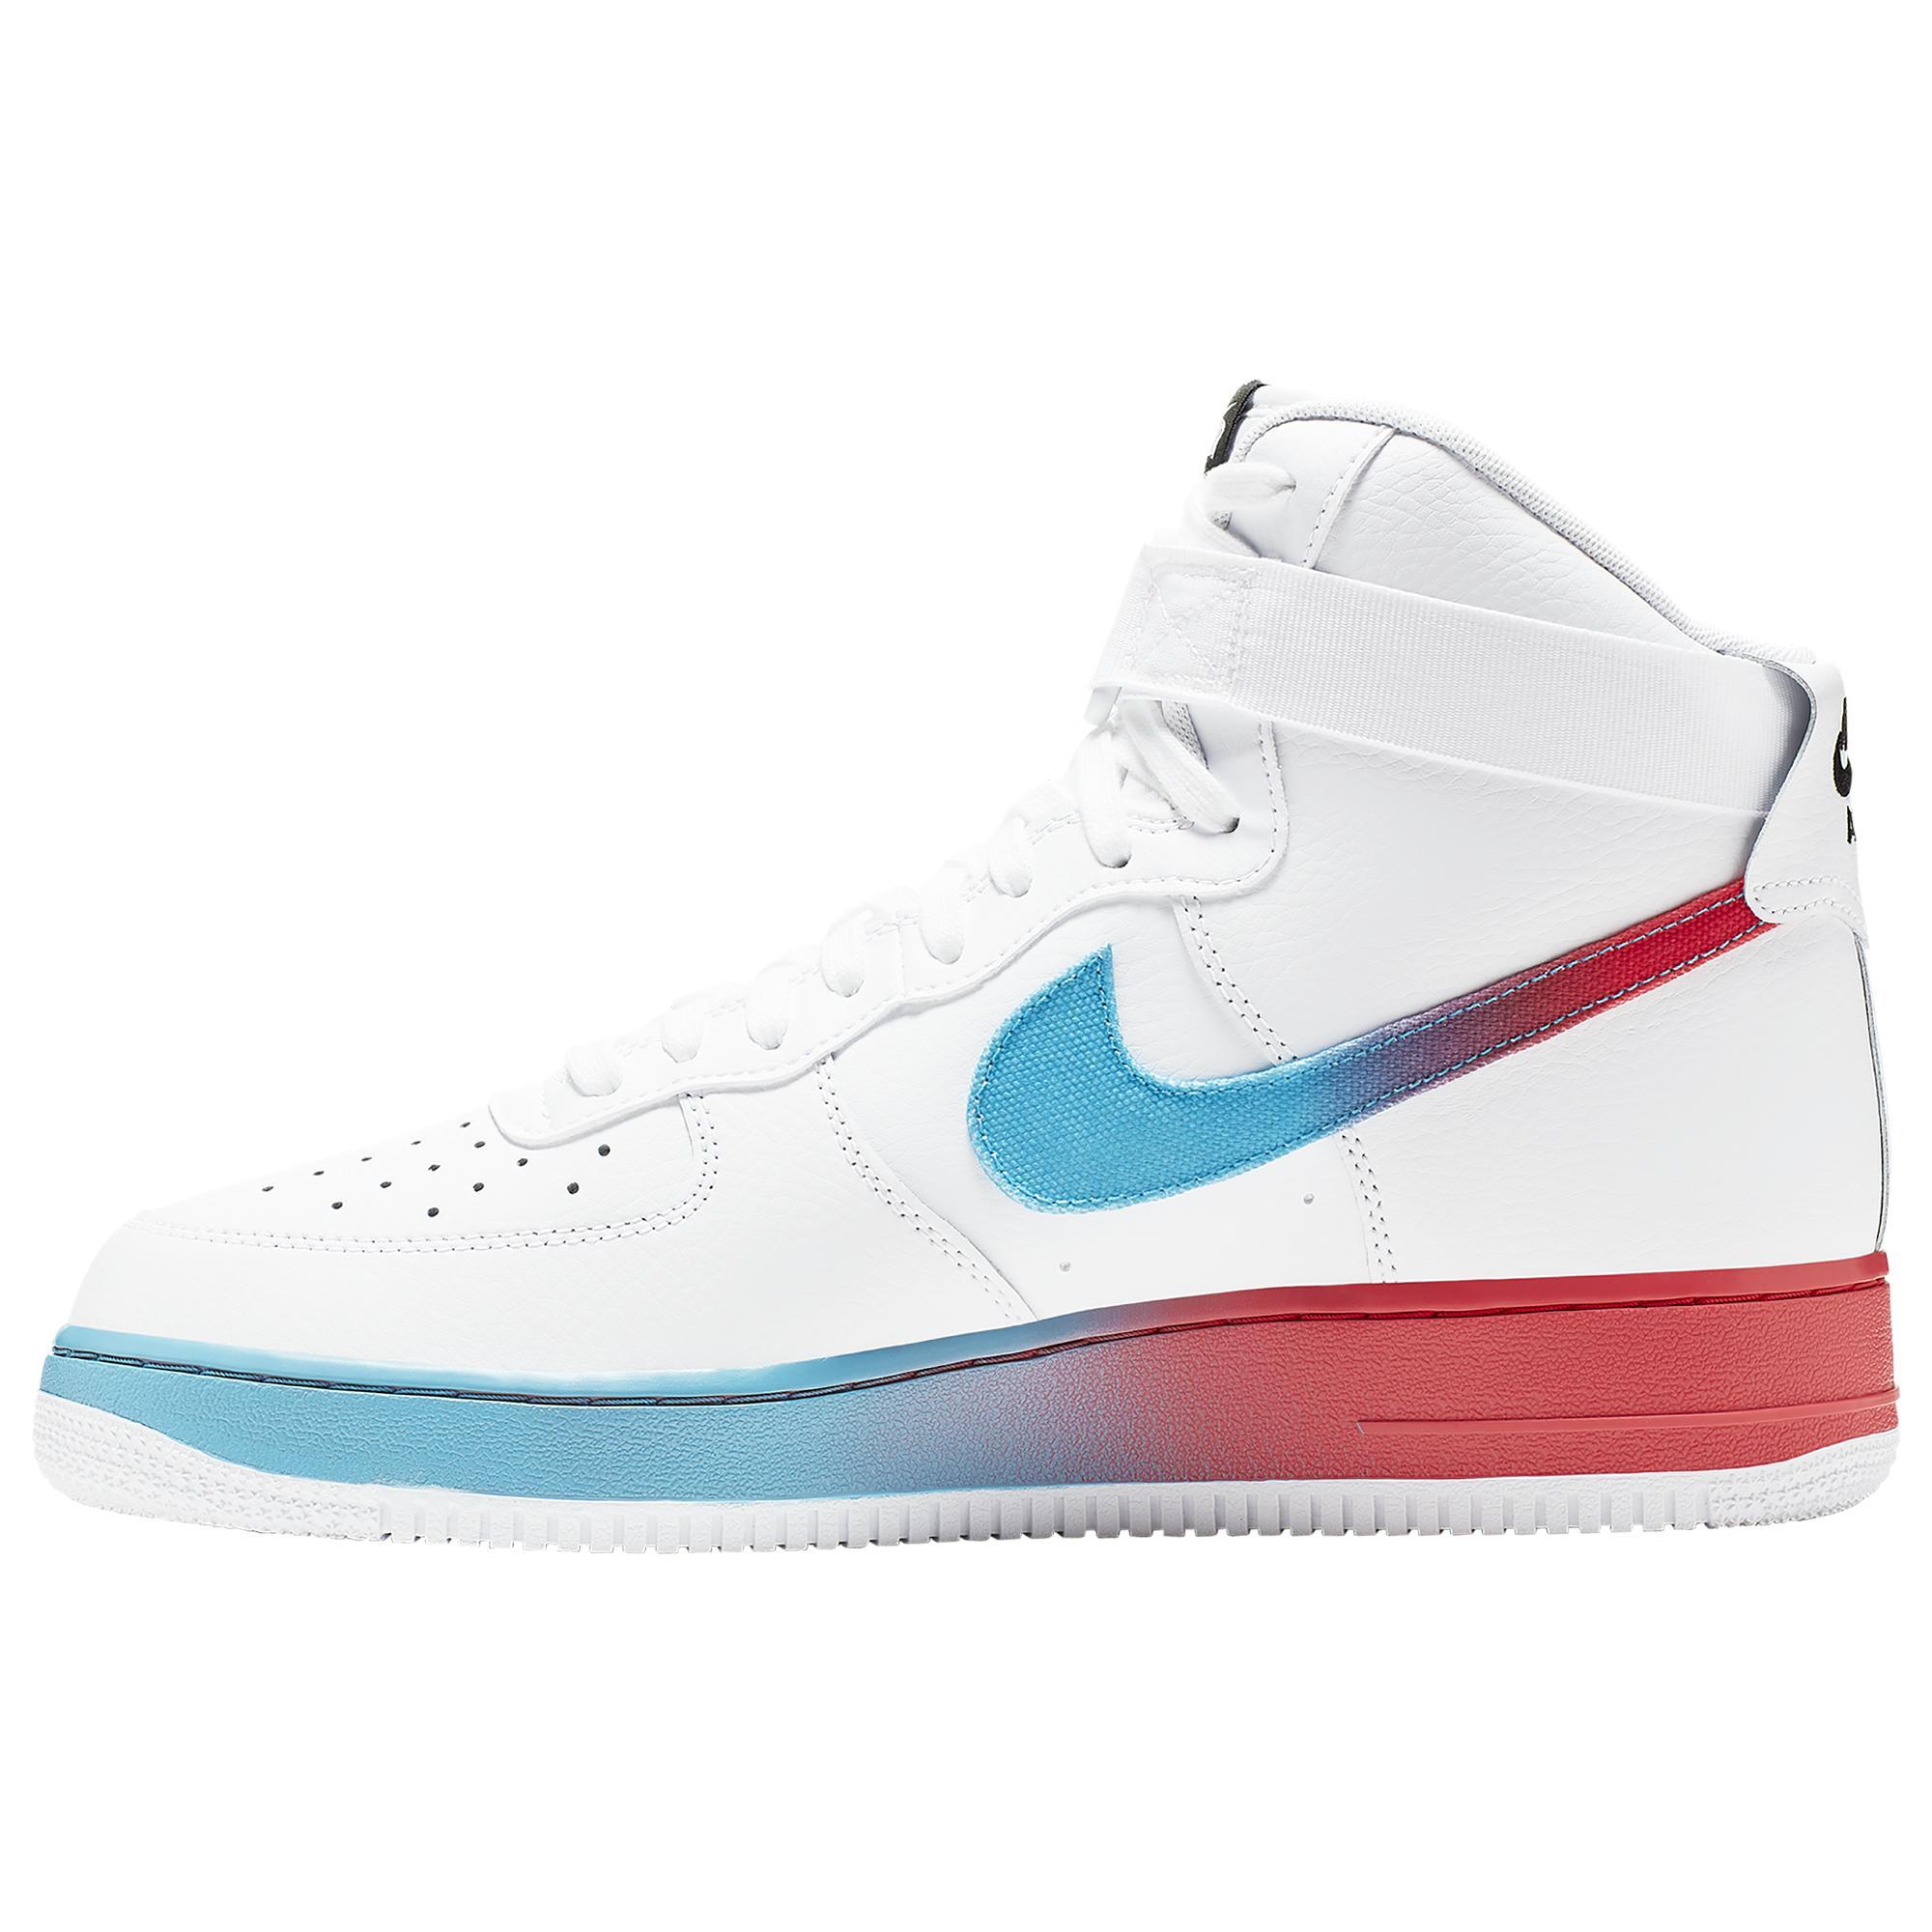 Air Force 1 High Lv8 Ap Basketball Shoes